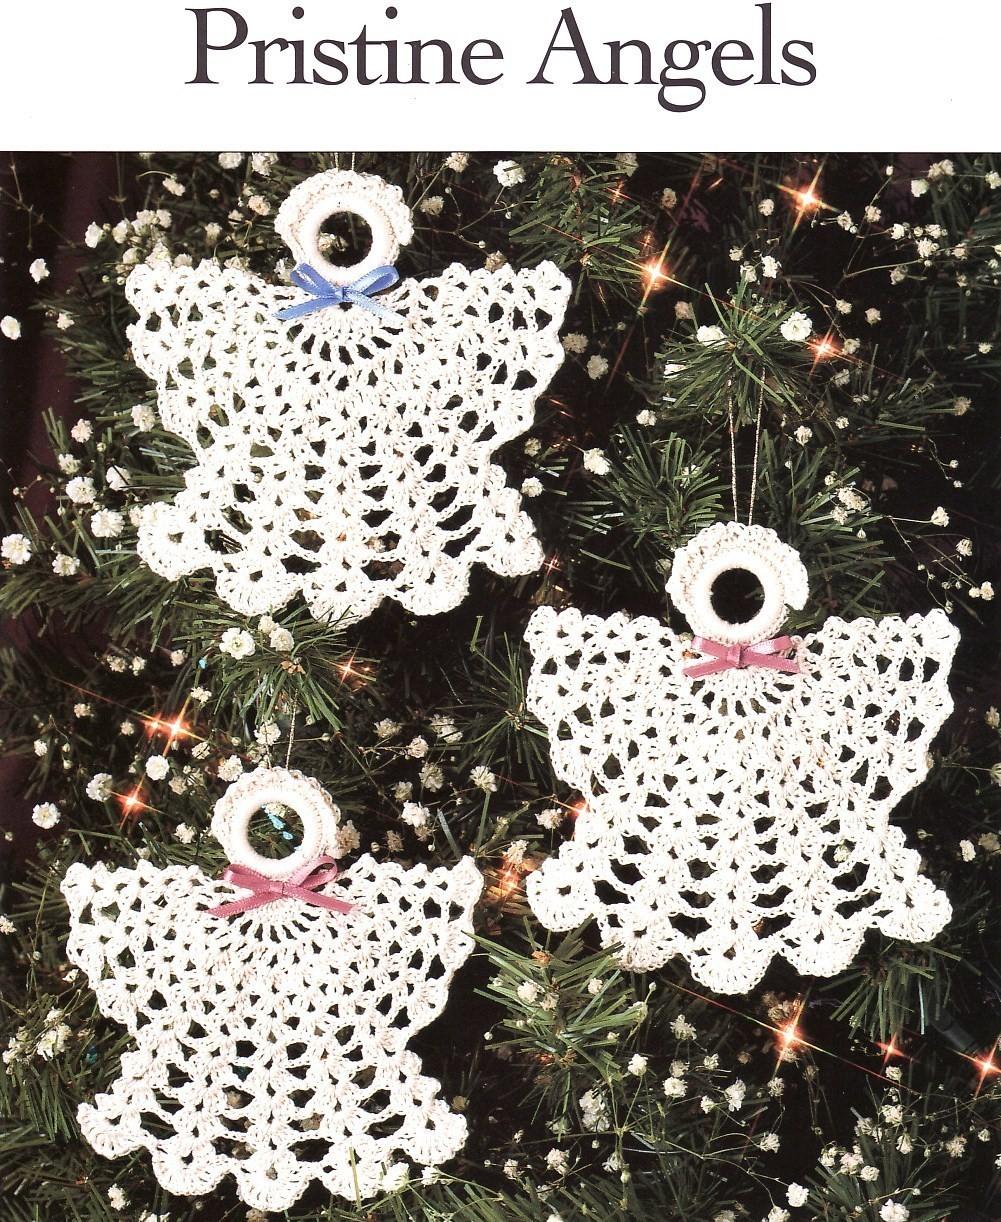 Pristine Angels Crochet Patterns Christmas Ornaments